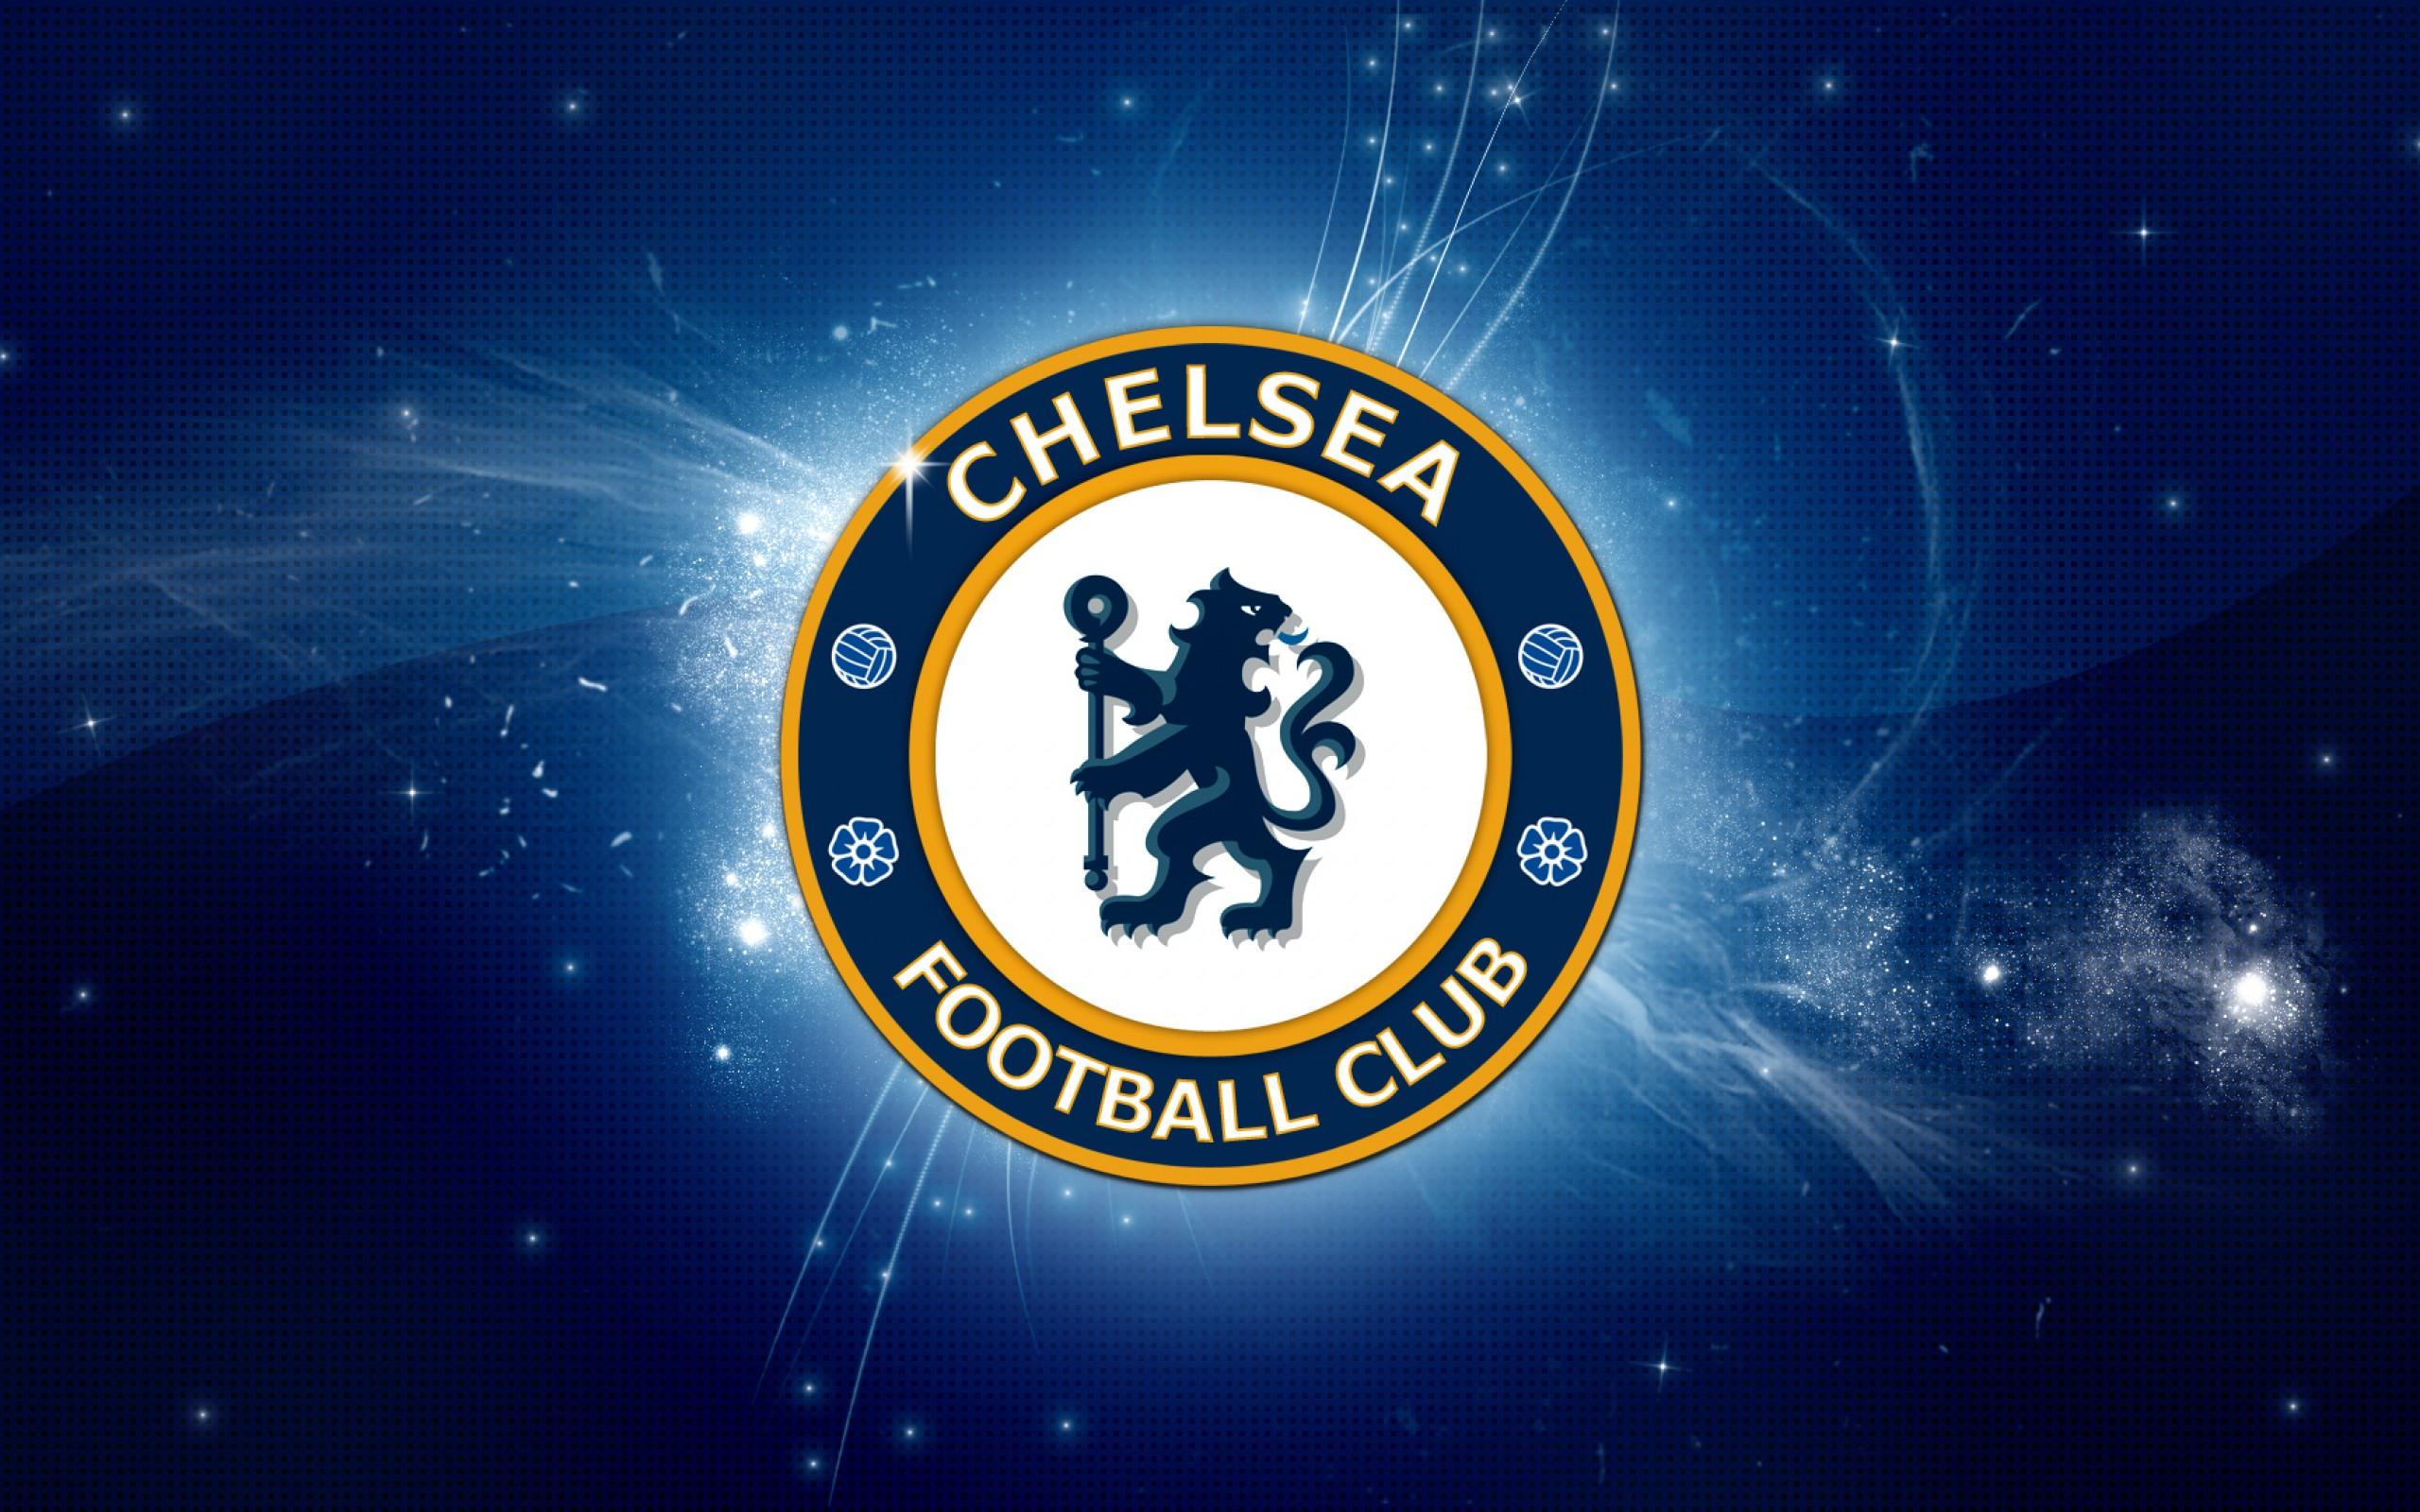 Chelsea FC Wallpaper 5104 2560x1600